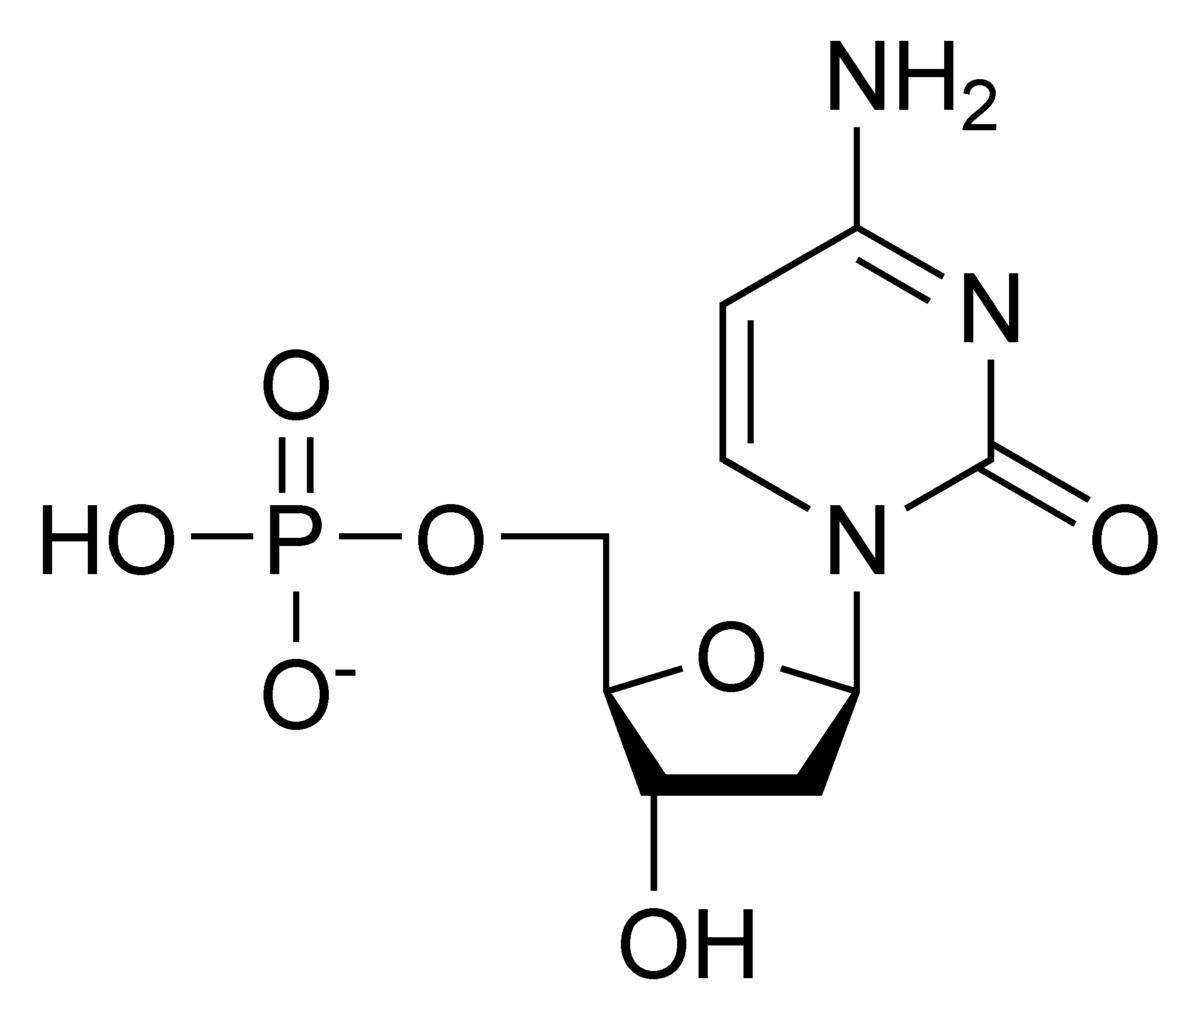 deoxynucleoside - photo #7